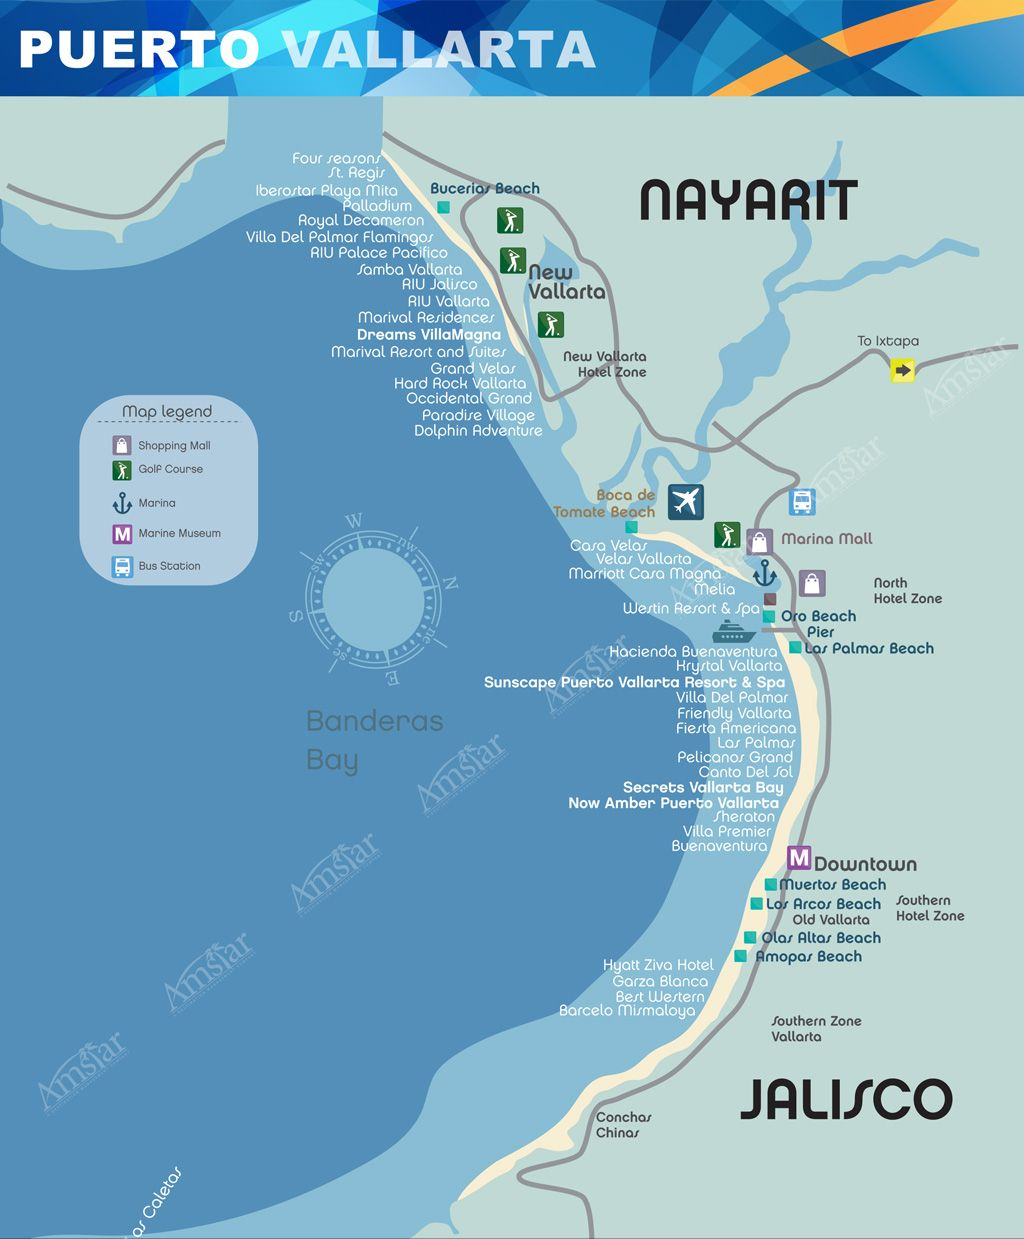 Things To Do In Puerto Vallarta Tips From A Local Expert Amstardmc Puerto Vallarta Mexico Vacation Puerto Vallarta Mexico Vacation